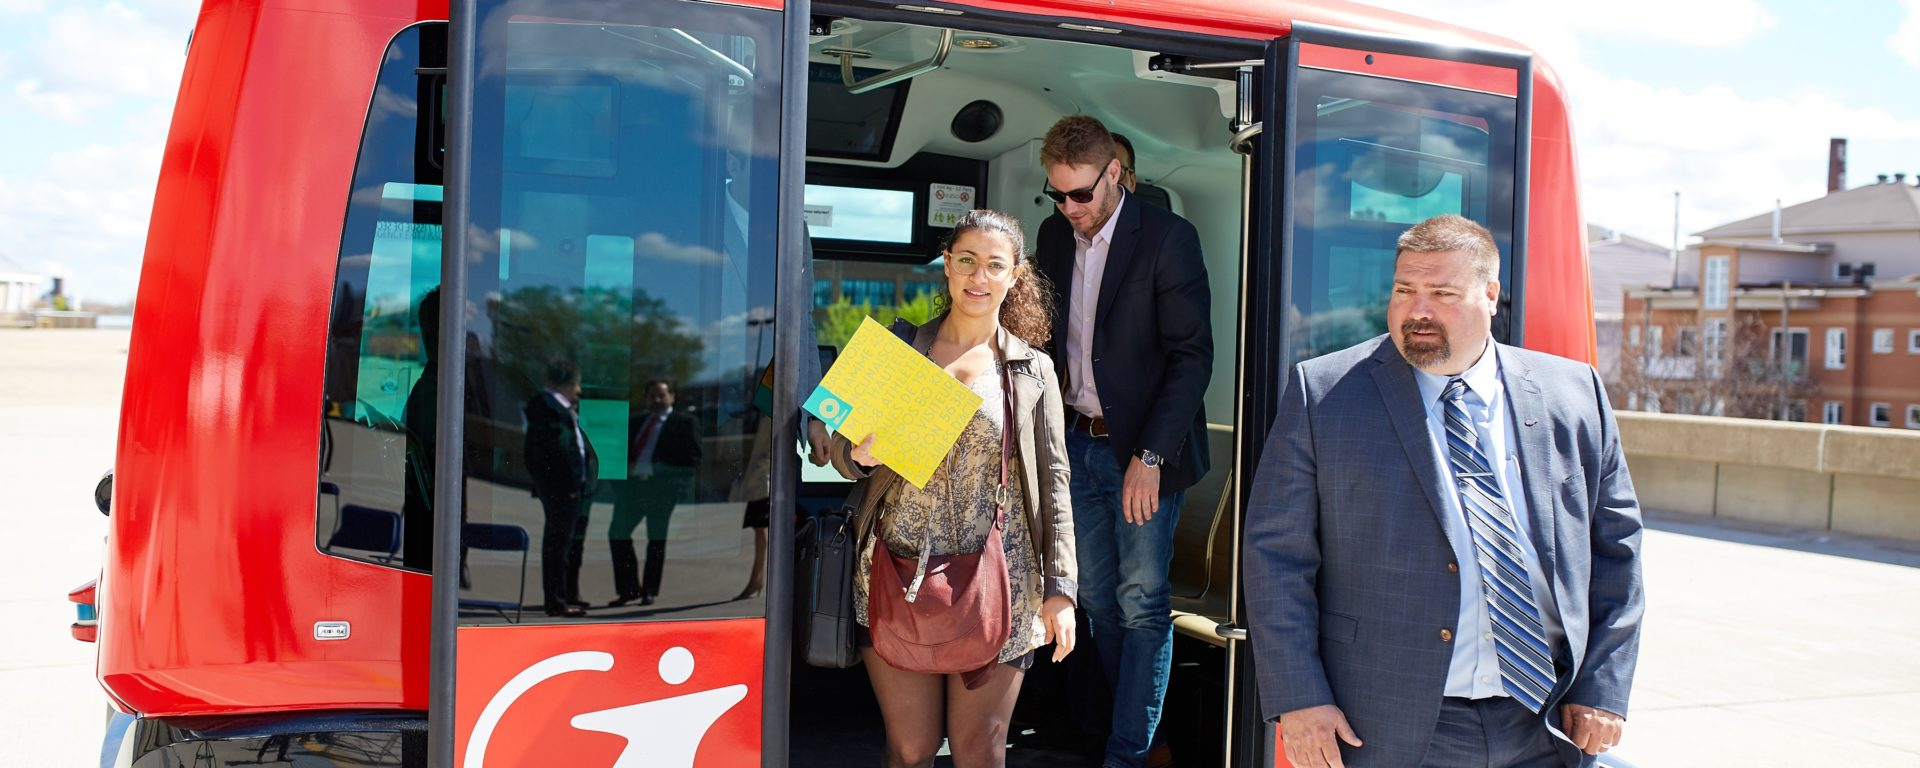 transdev,transport,service,2018